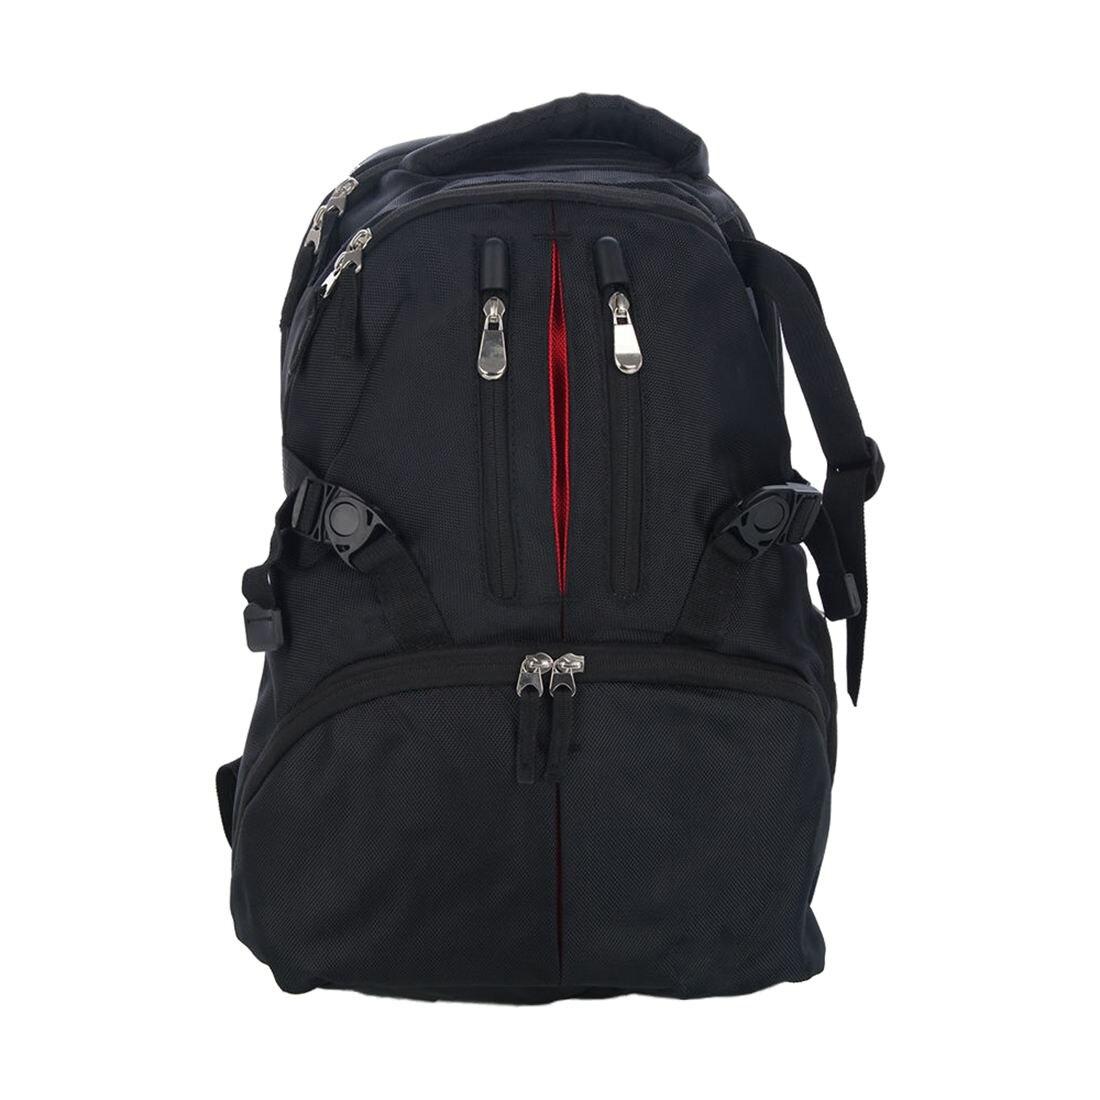 Camera Bag DSLR SLR Laptop Backpack Rucksack Case For Nikon Sony Canon Olympus case for nikon slr laptop backpack camera bag dslr - title=